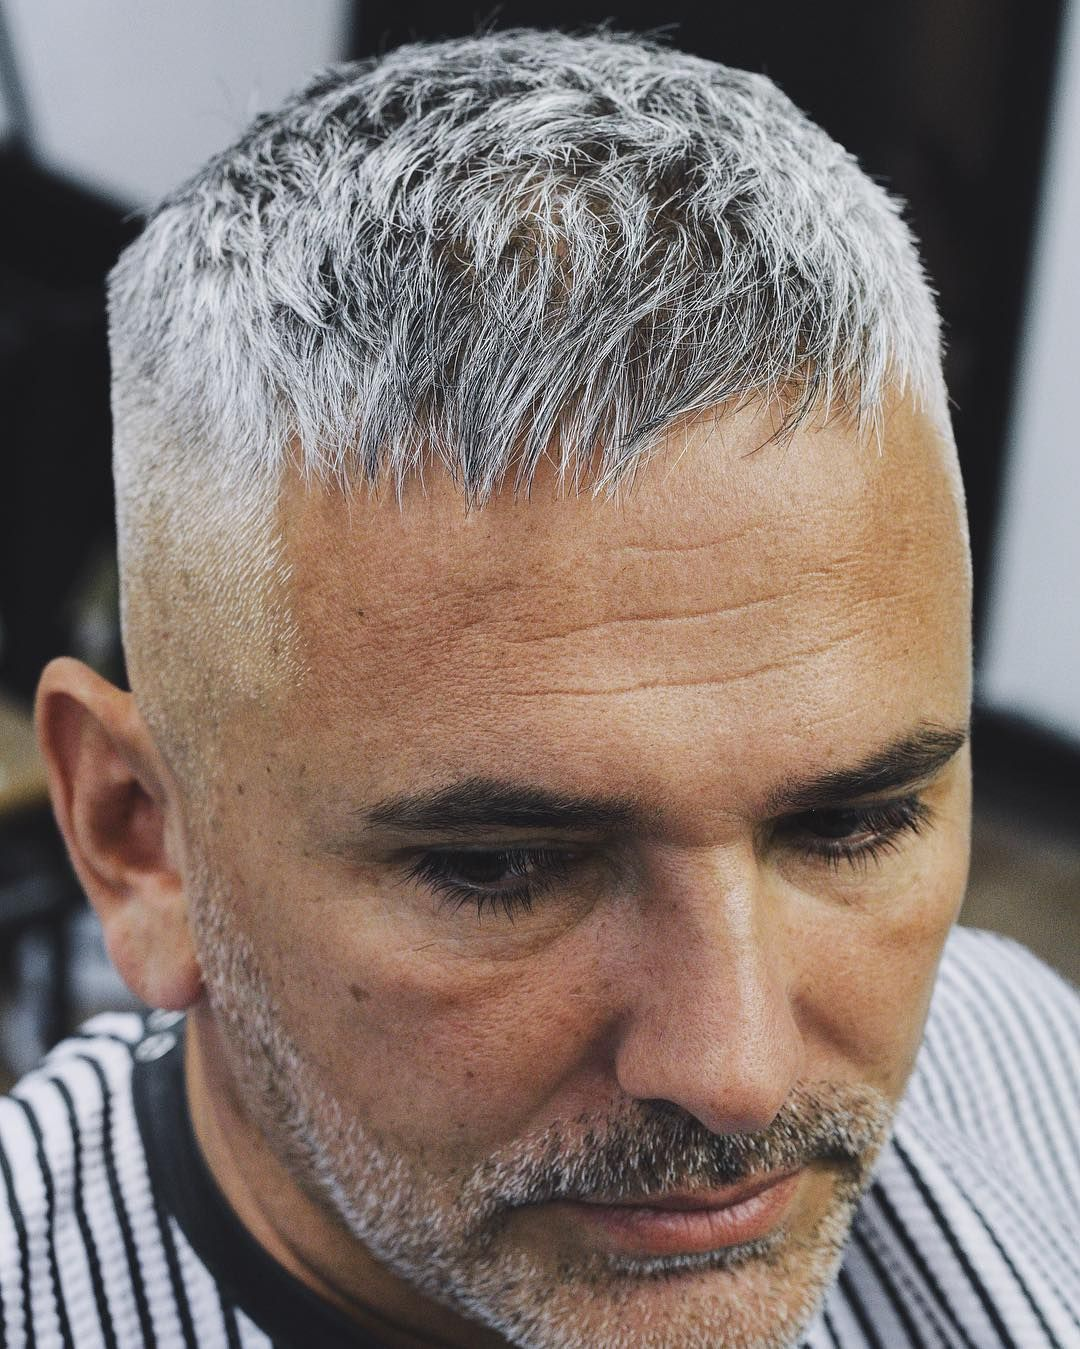 This Textured Caesar Crop Is A Stylish Men S Haircut For Thinning Hair It Makes Hair Appear T Short Haircuts For Older Men Older Mens Hairstyles Thin Hair Men